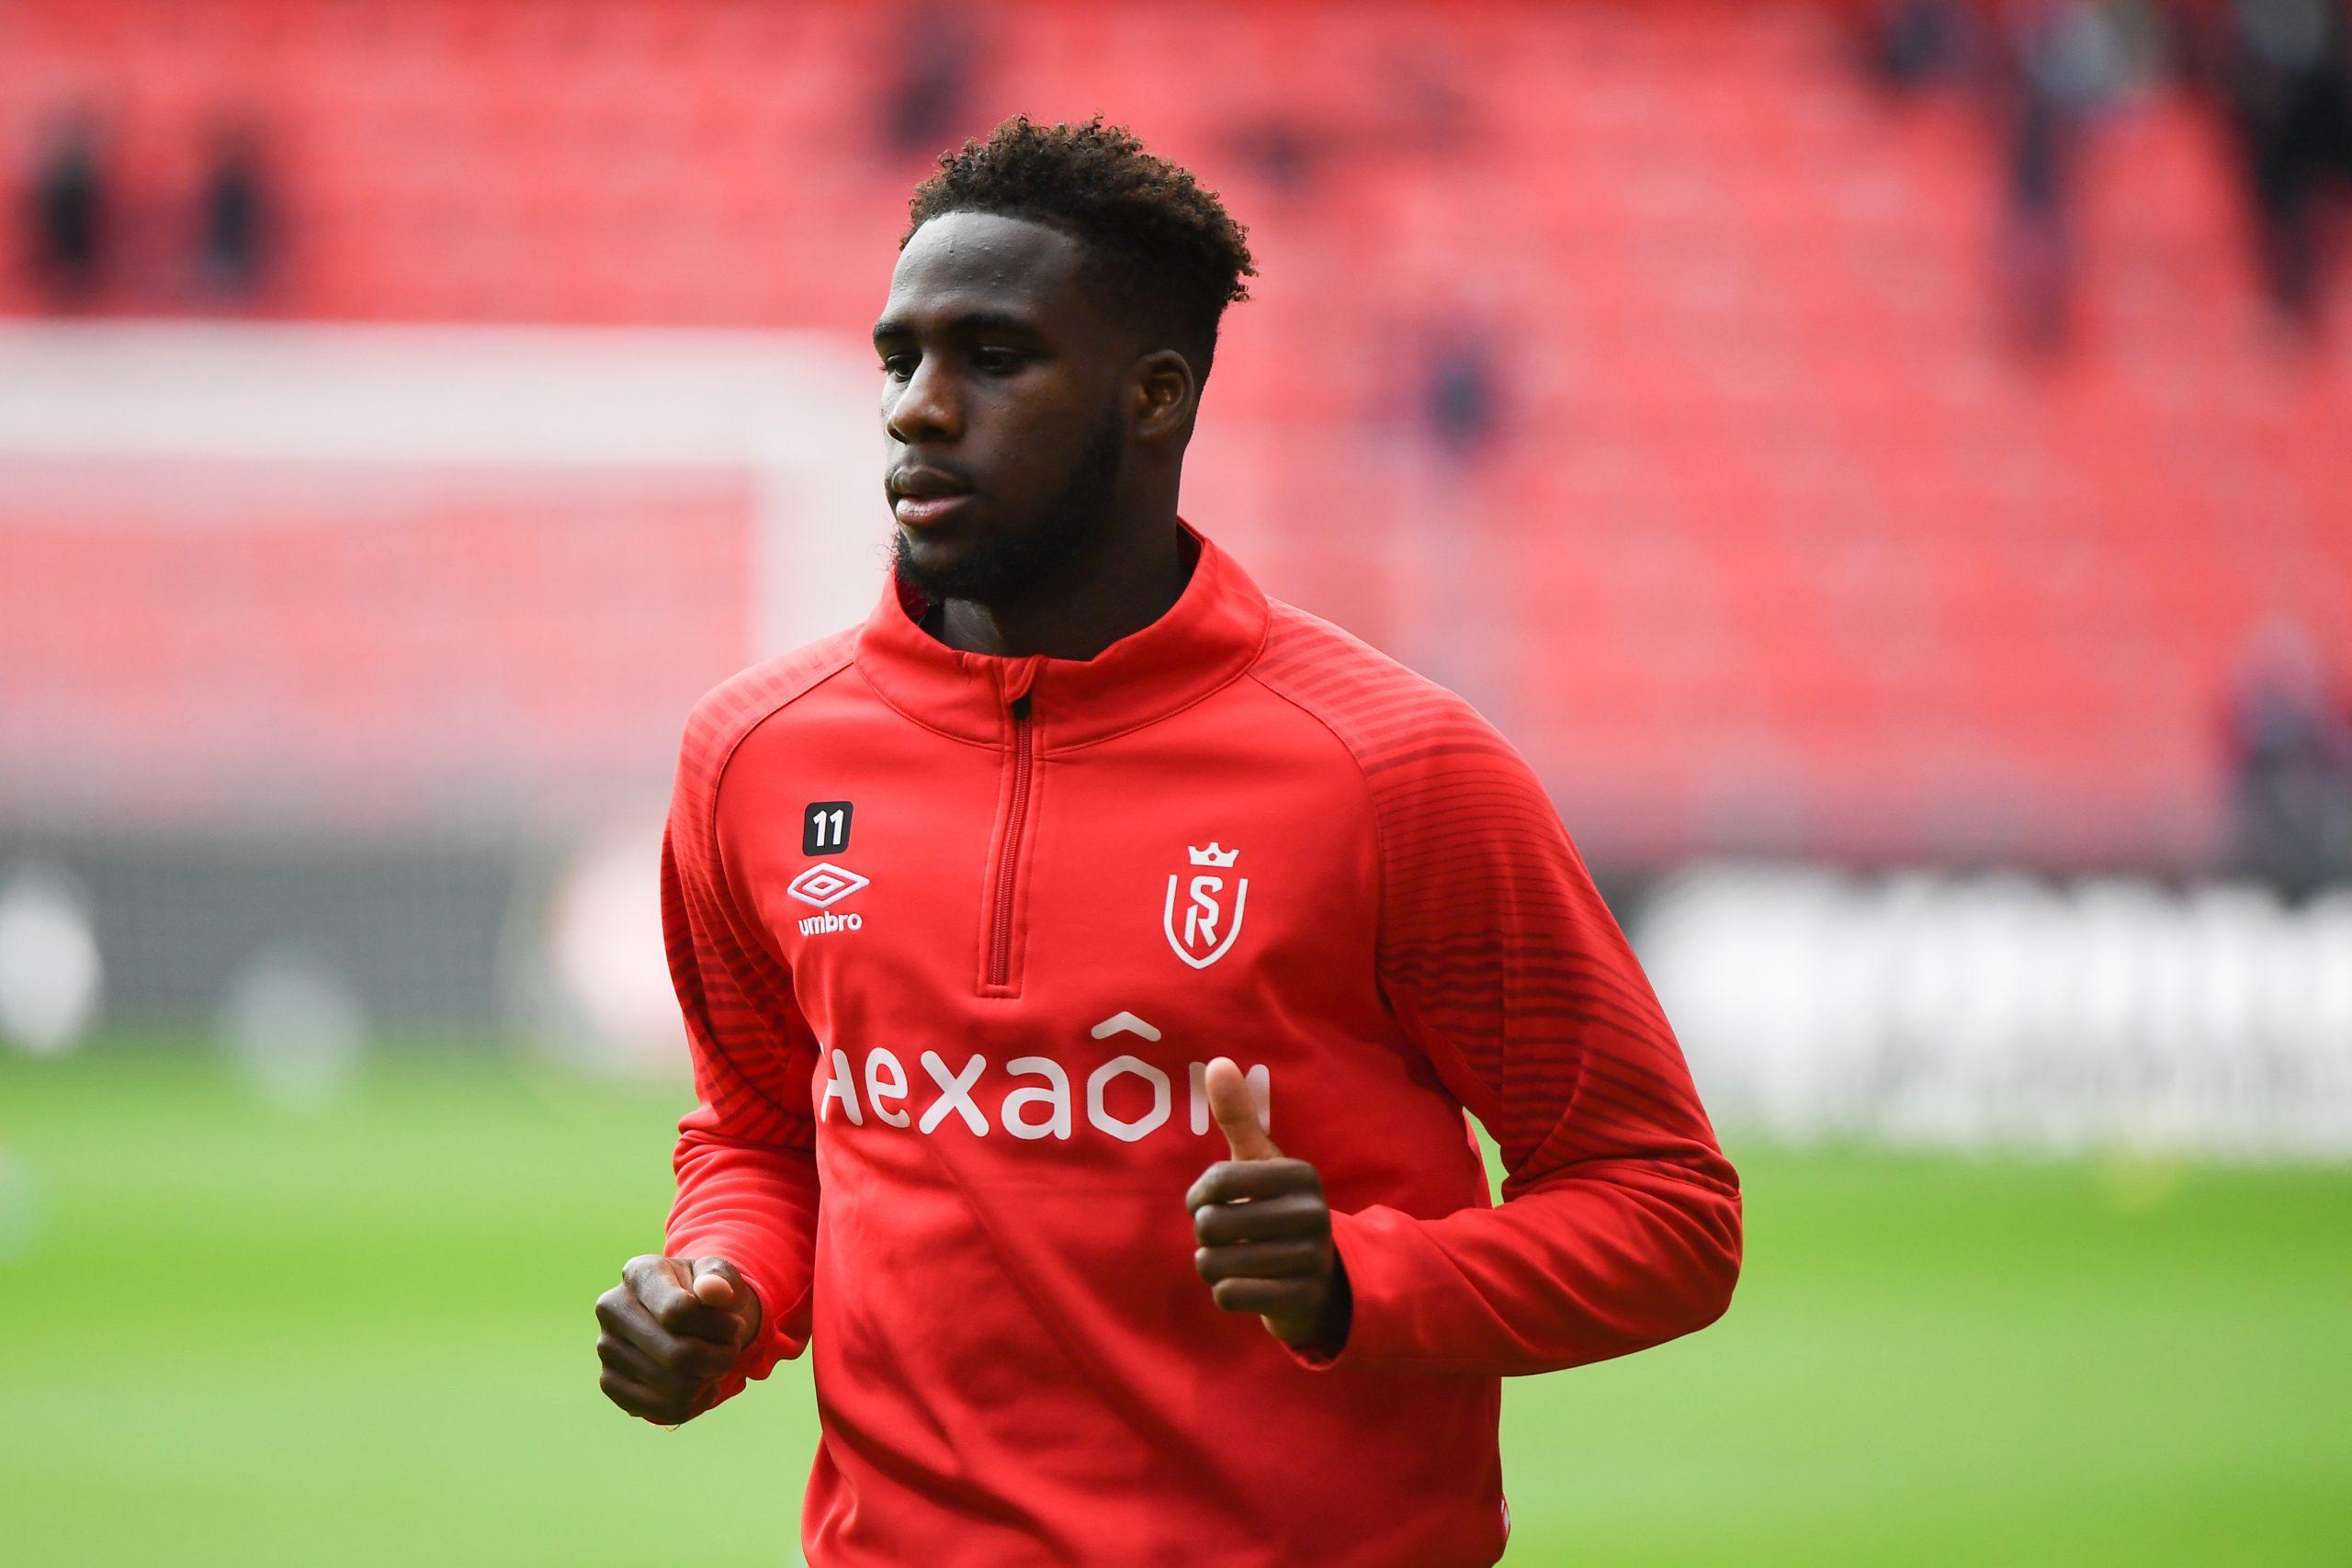 Mercato OM : Lyon s'immisce dans le dossier Boulaye Dia